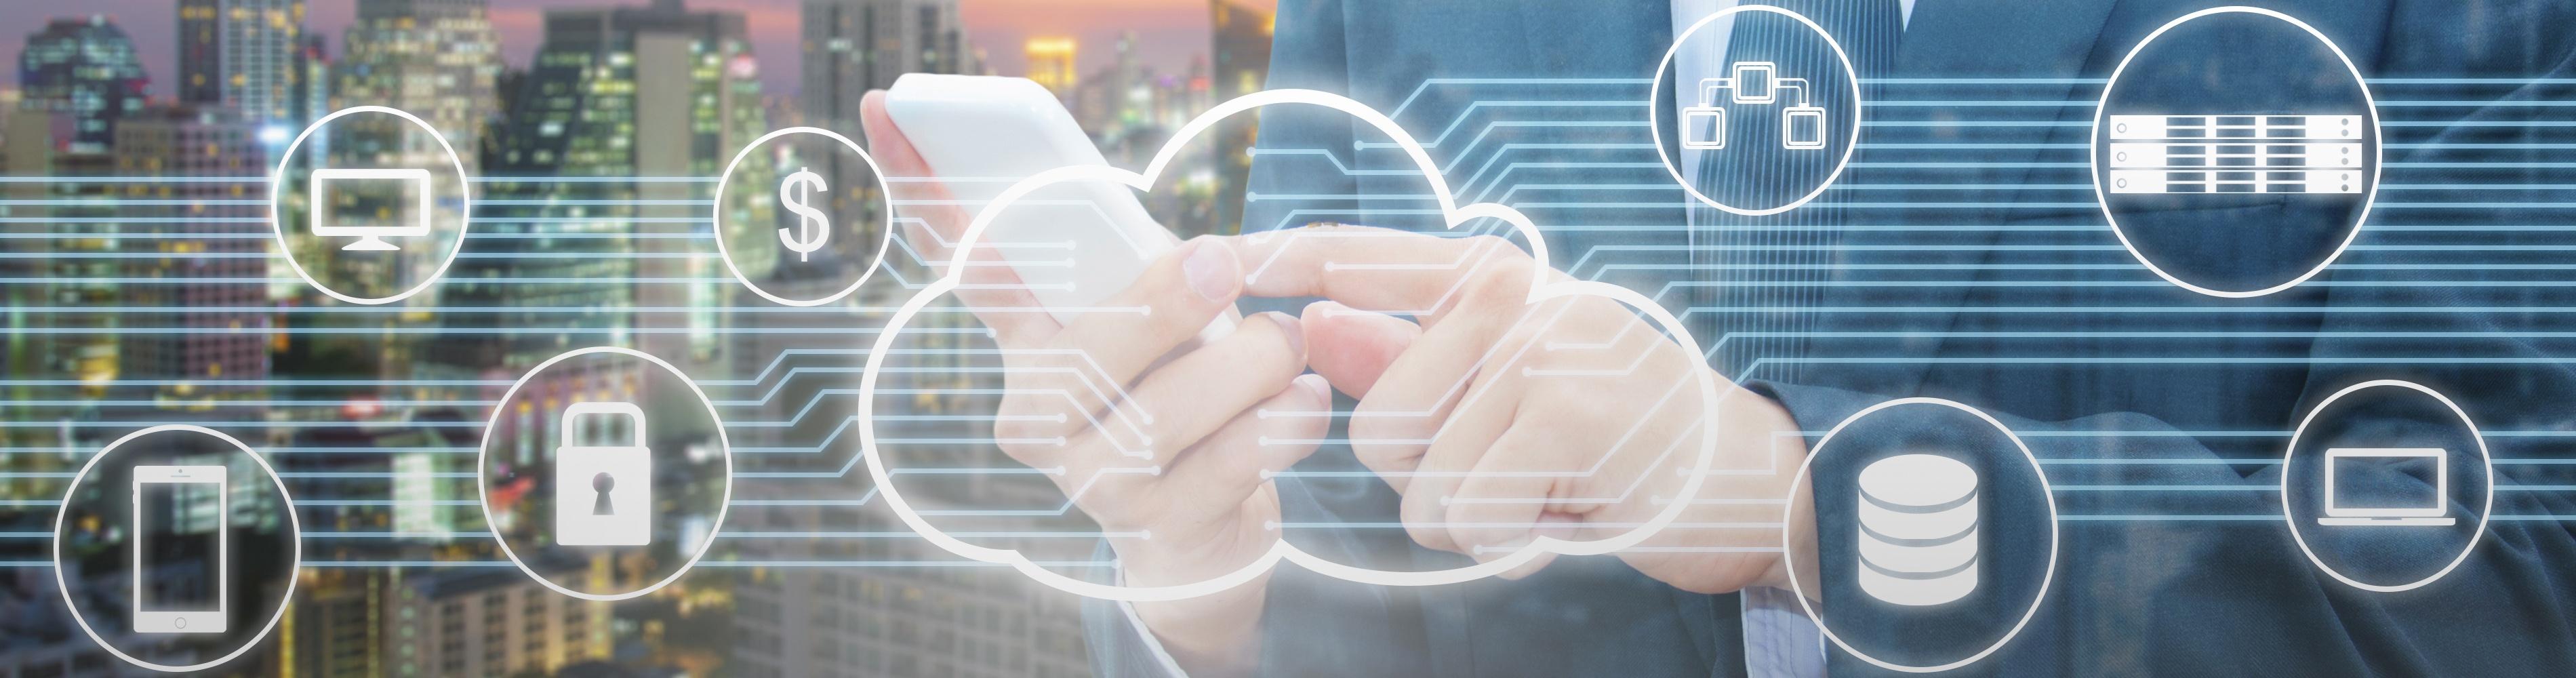 I cinque (più uno) vantaggi del Cloud gestito